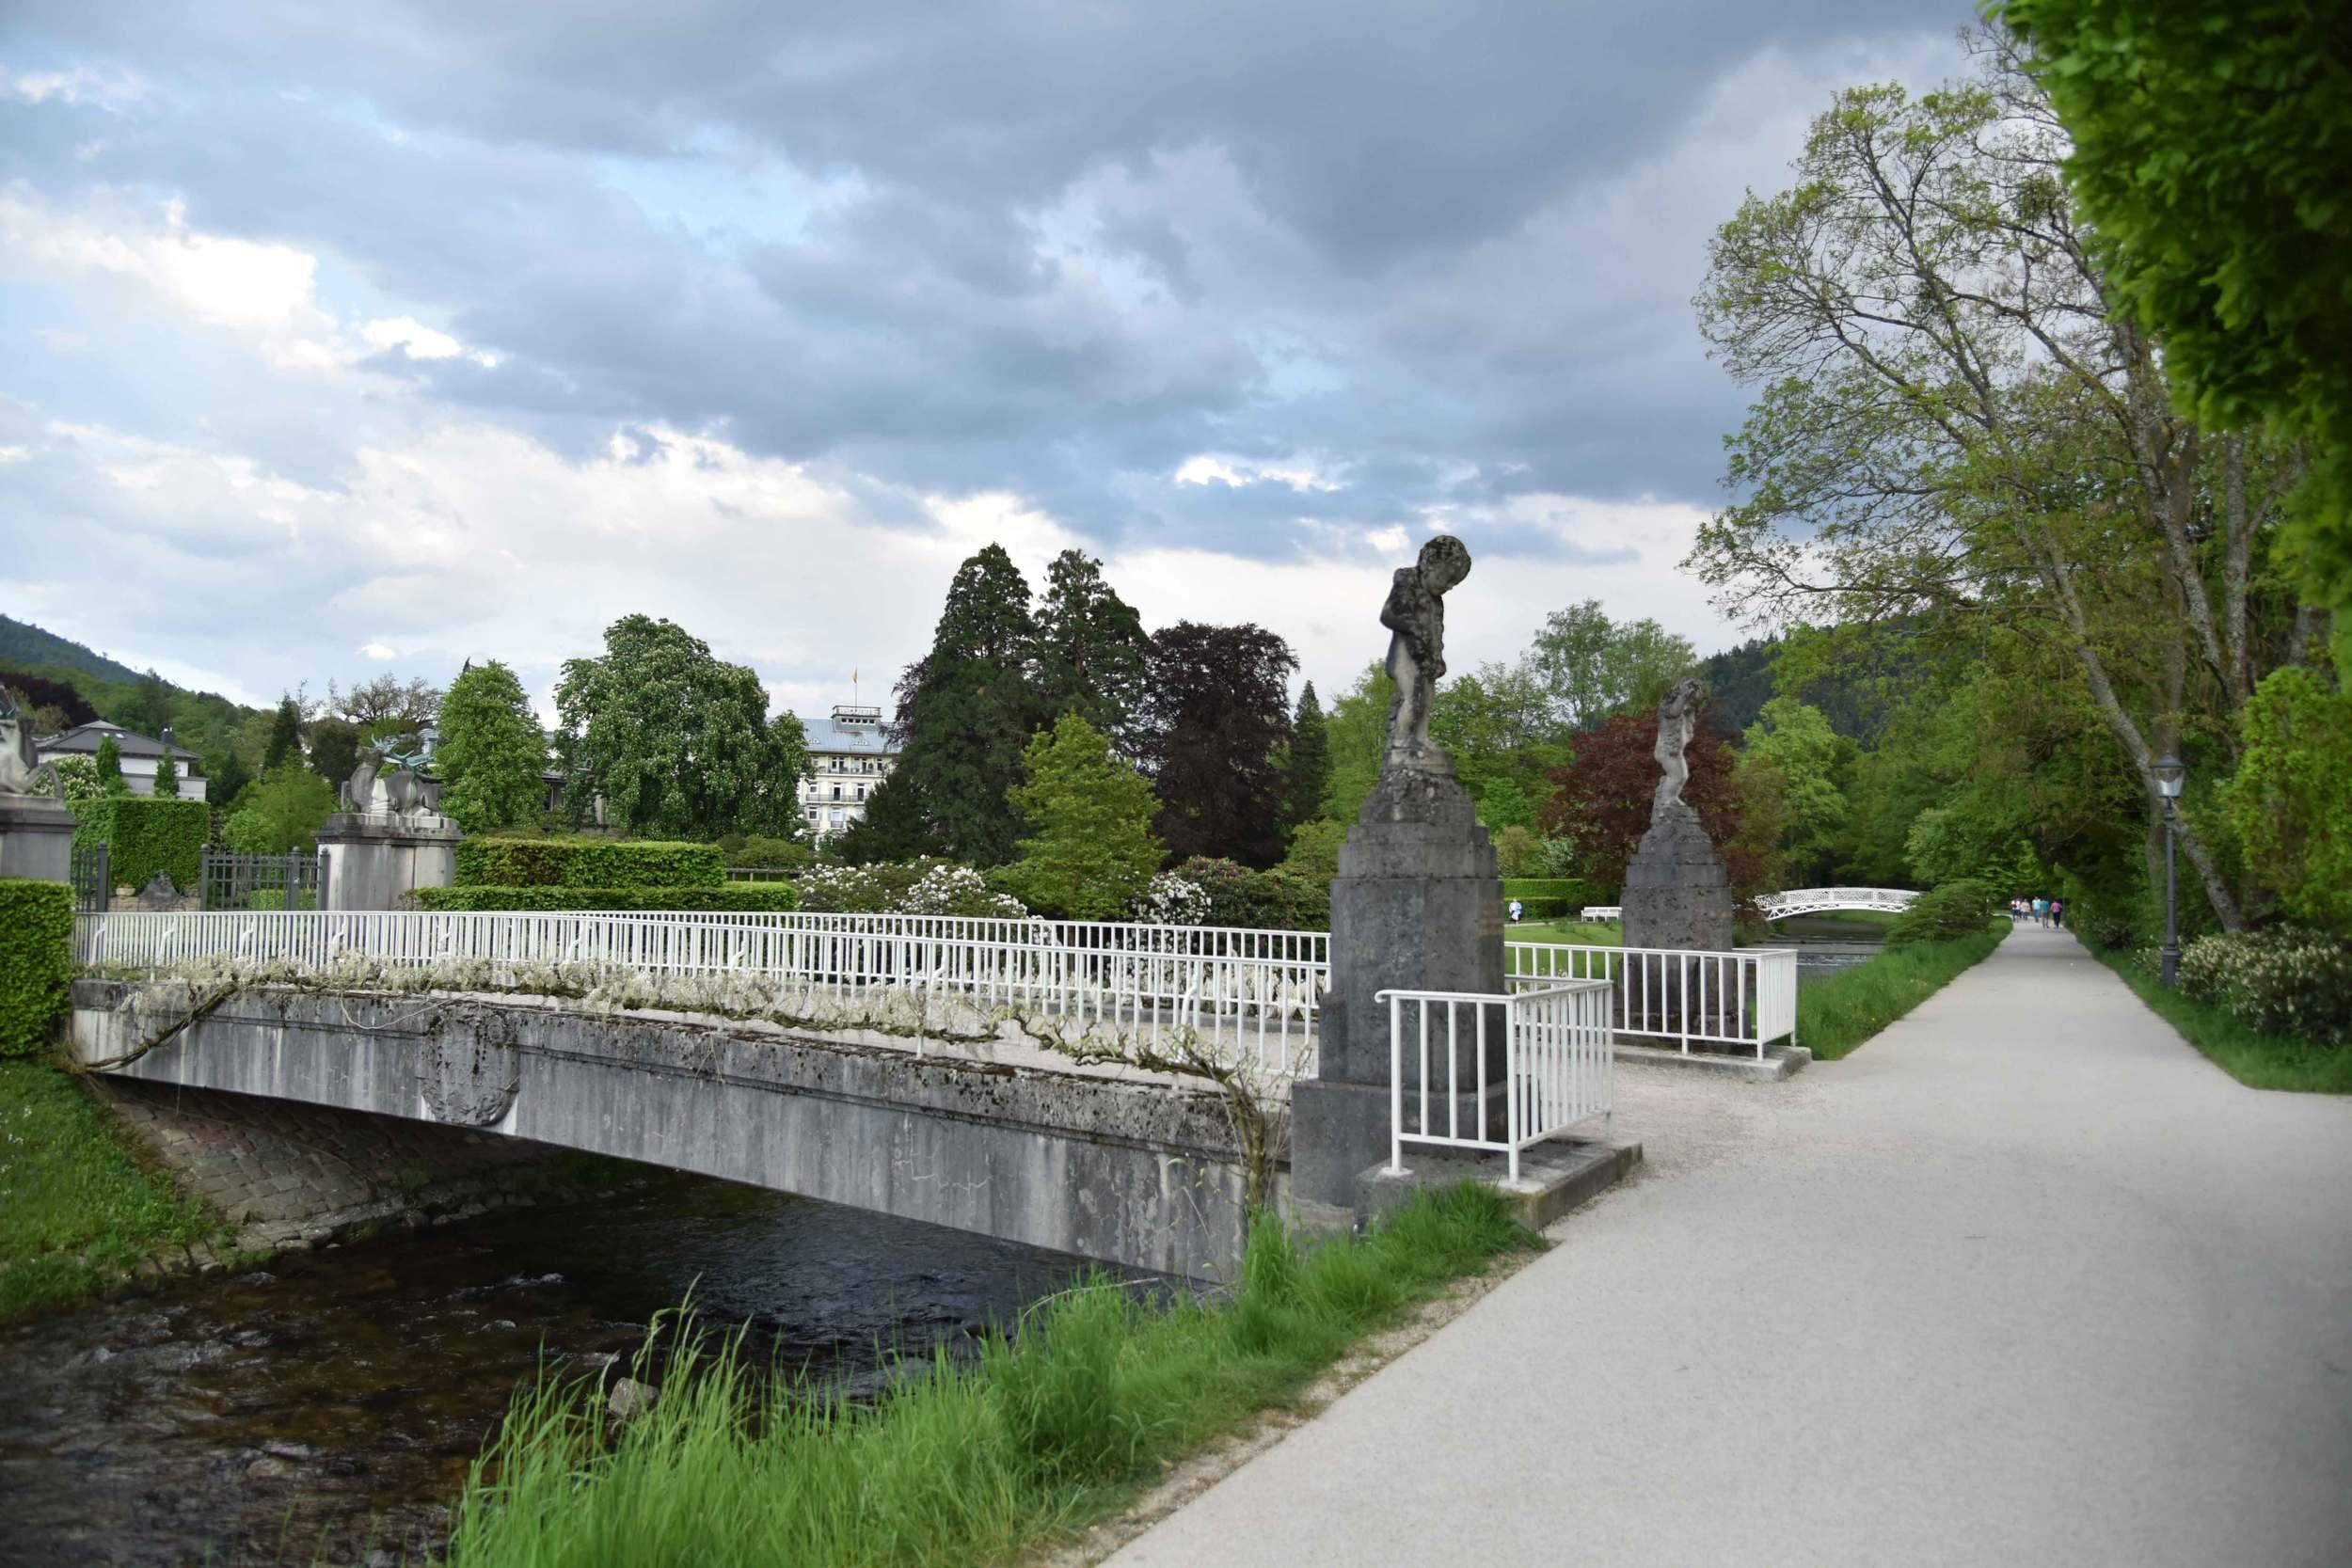 Gönneranlage, rose garden, Lichtentaler Allee, Baden Baden, Germany. Image©sourcingstyle.com